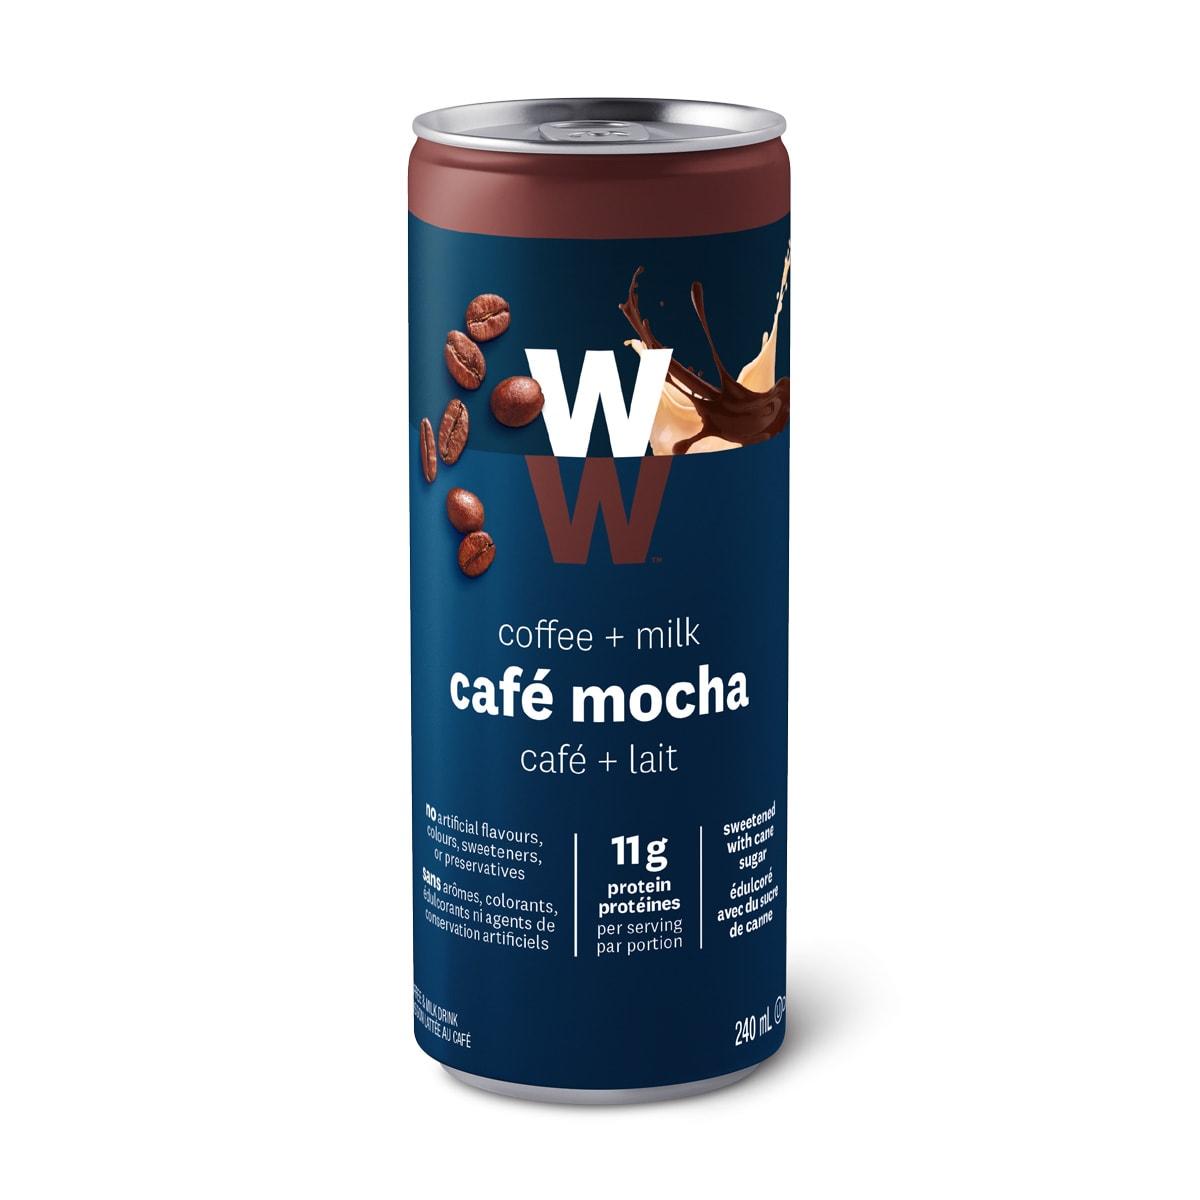 WW Cafe Mocha, Single Can Front